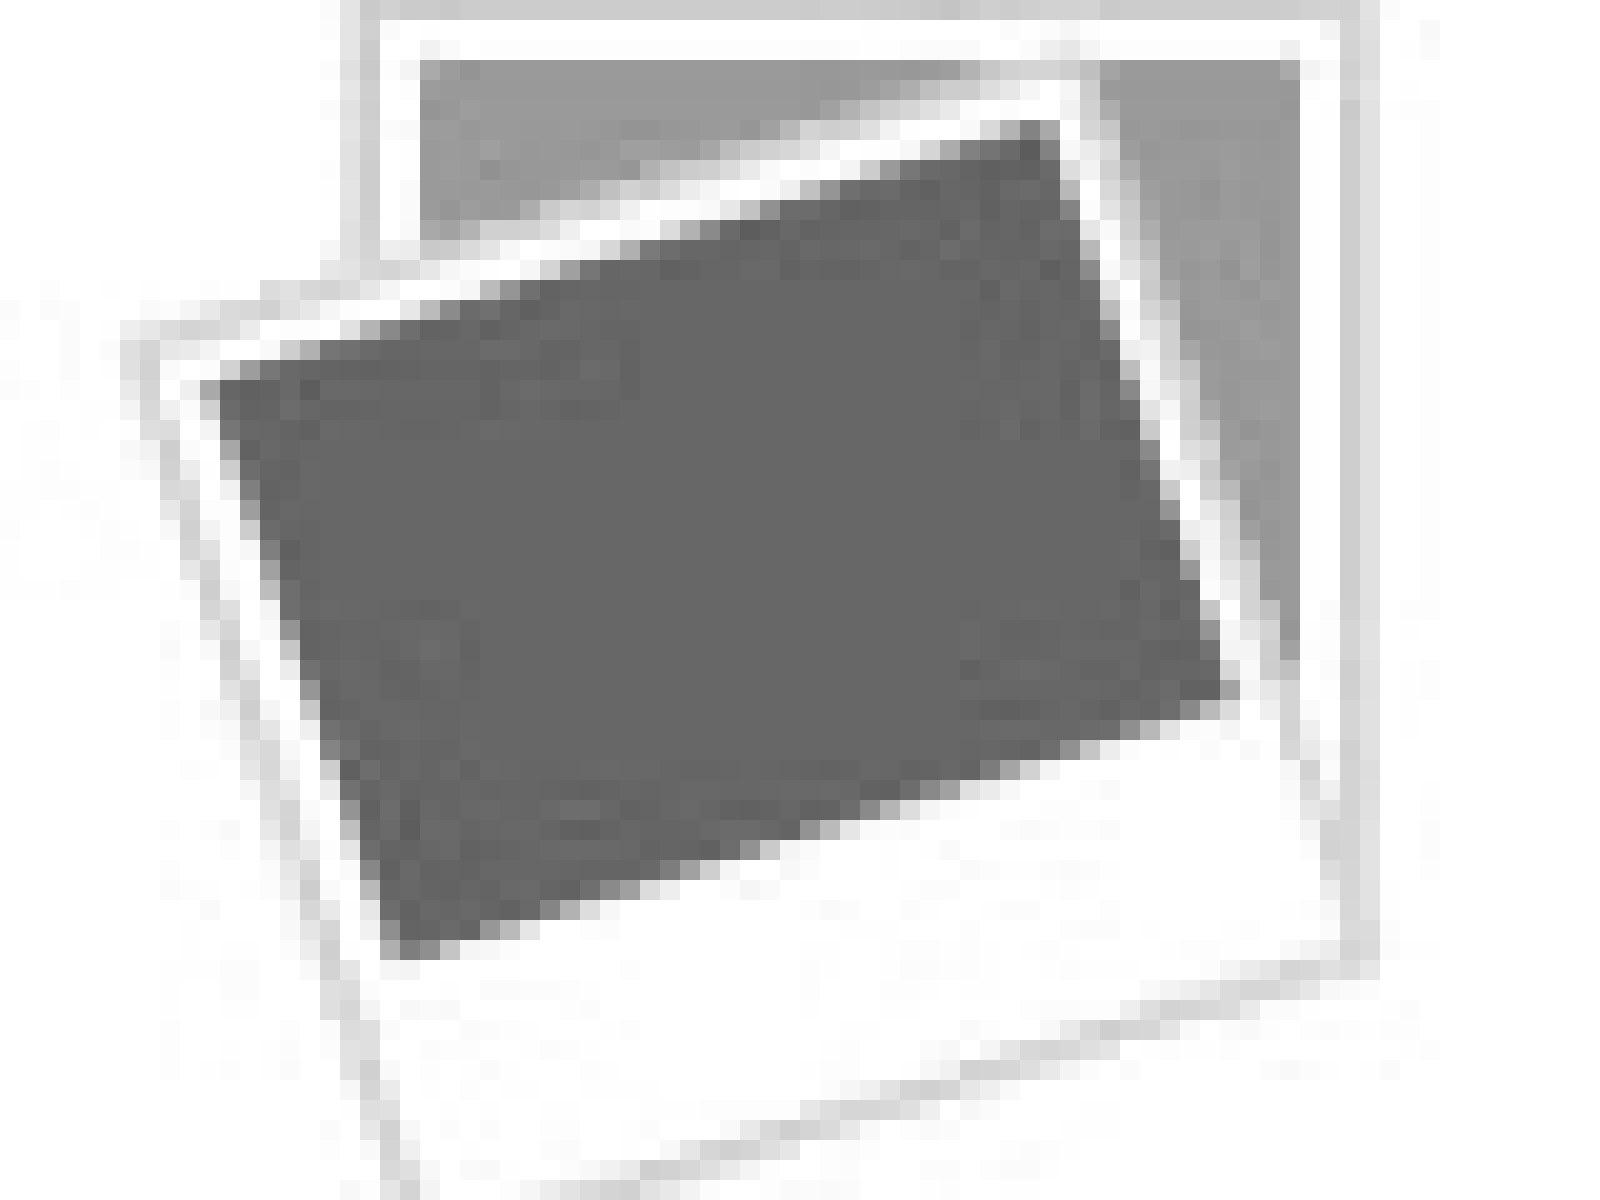 Used Lexus ES330 Consoles & Parts for Sale